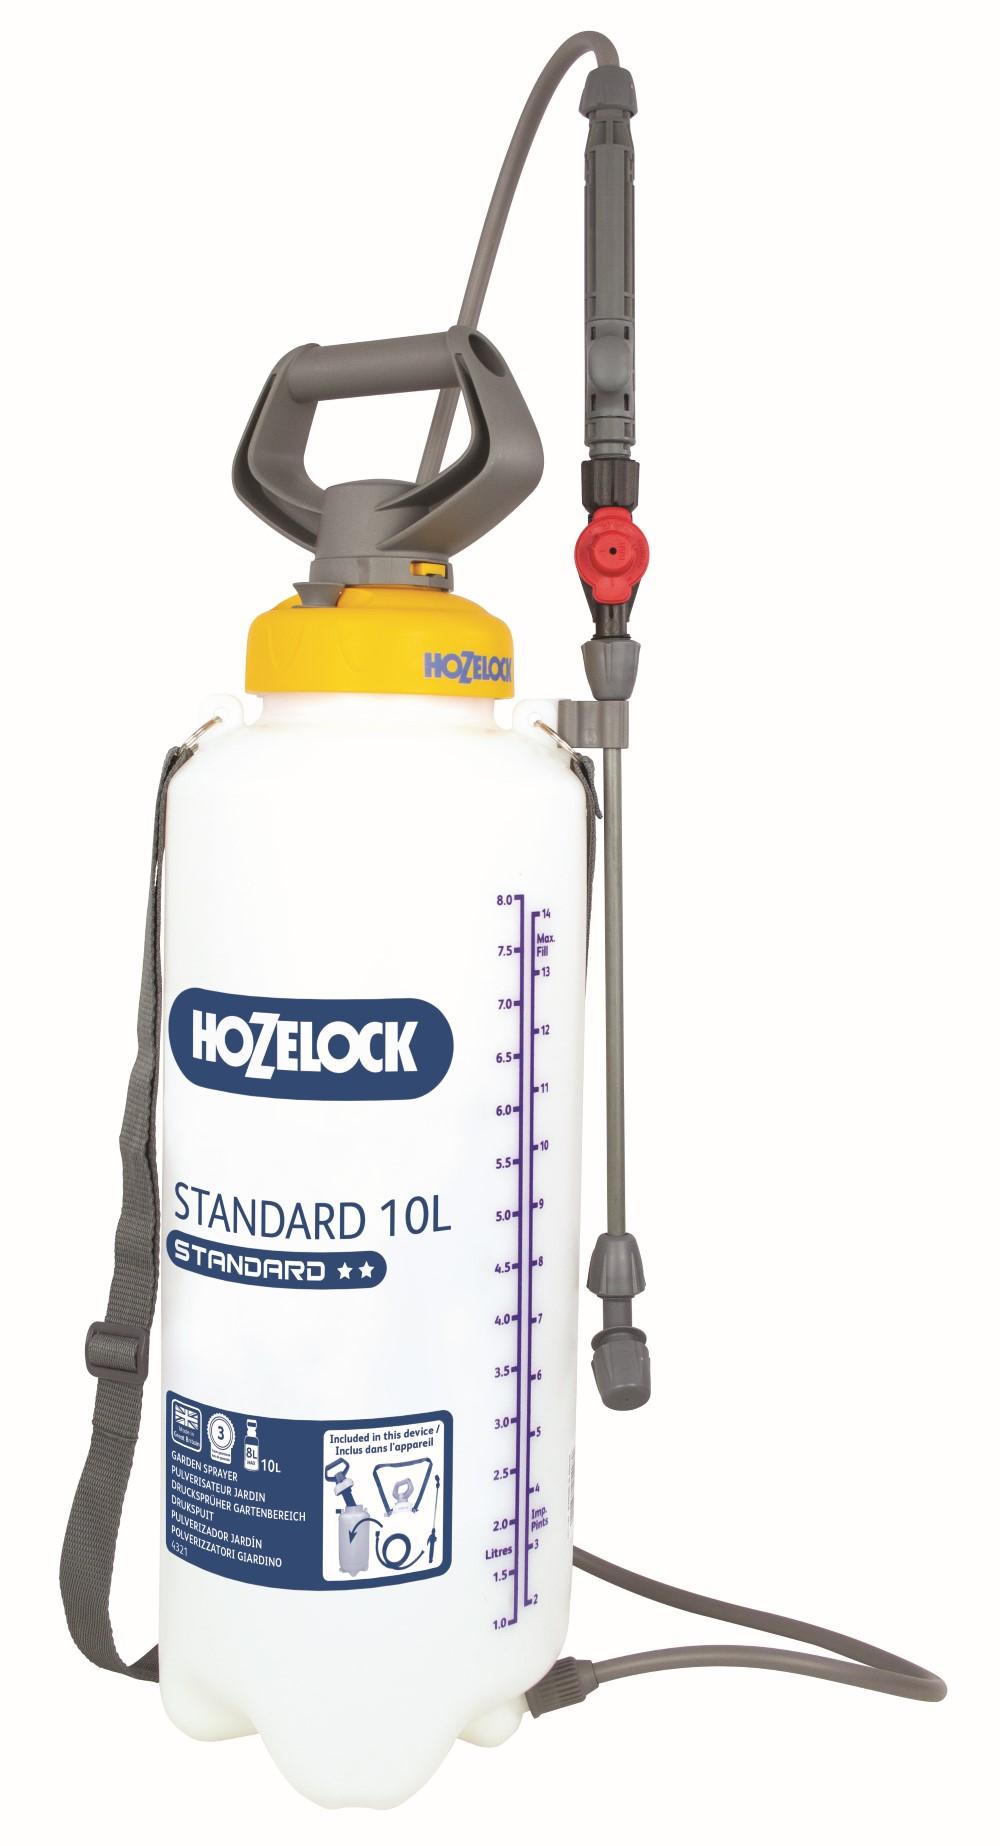 Hozelock Drukspuit Standaard 10 Liter